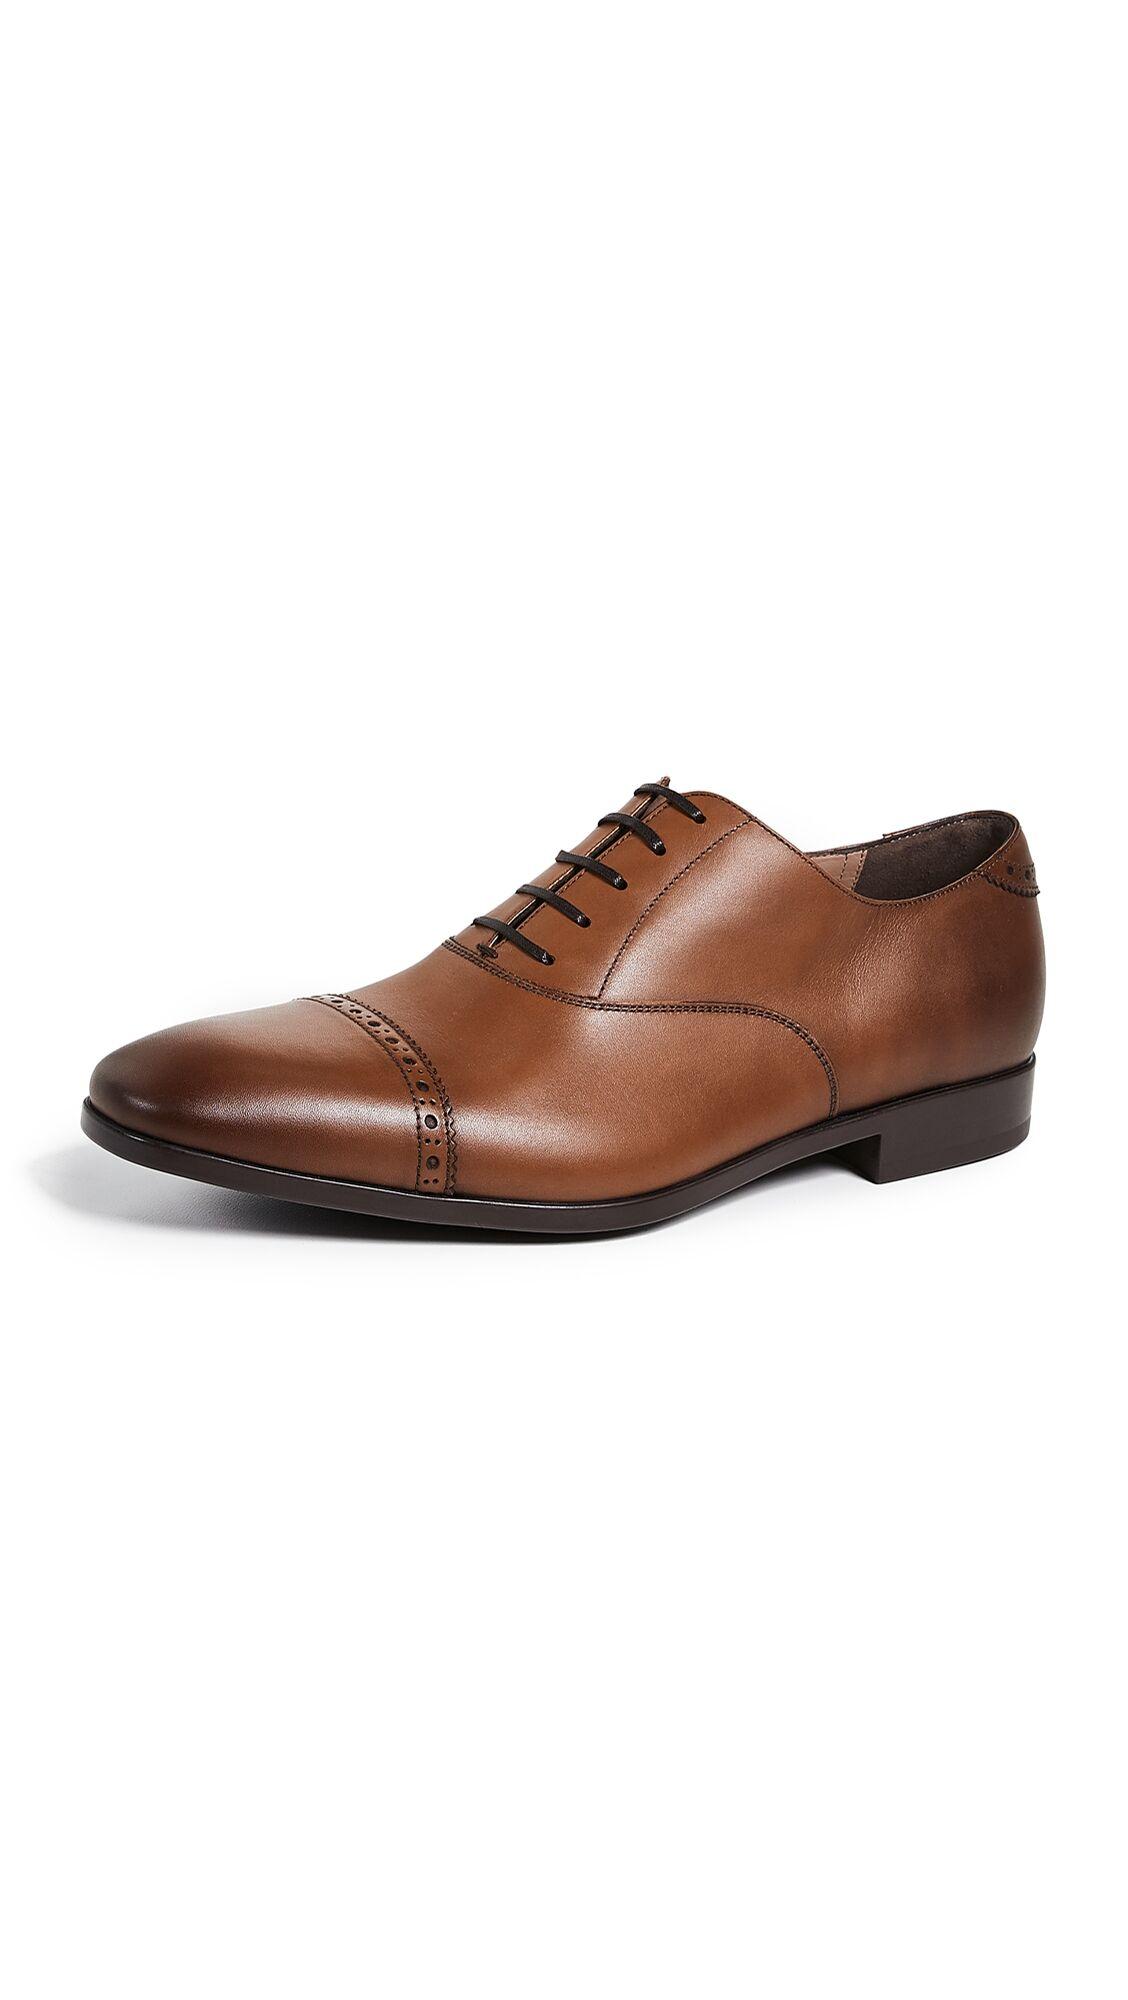 Salvatore Ferragamo Boston Cap Toe Lace Up Shoes - Brown - Size: 10